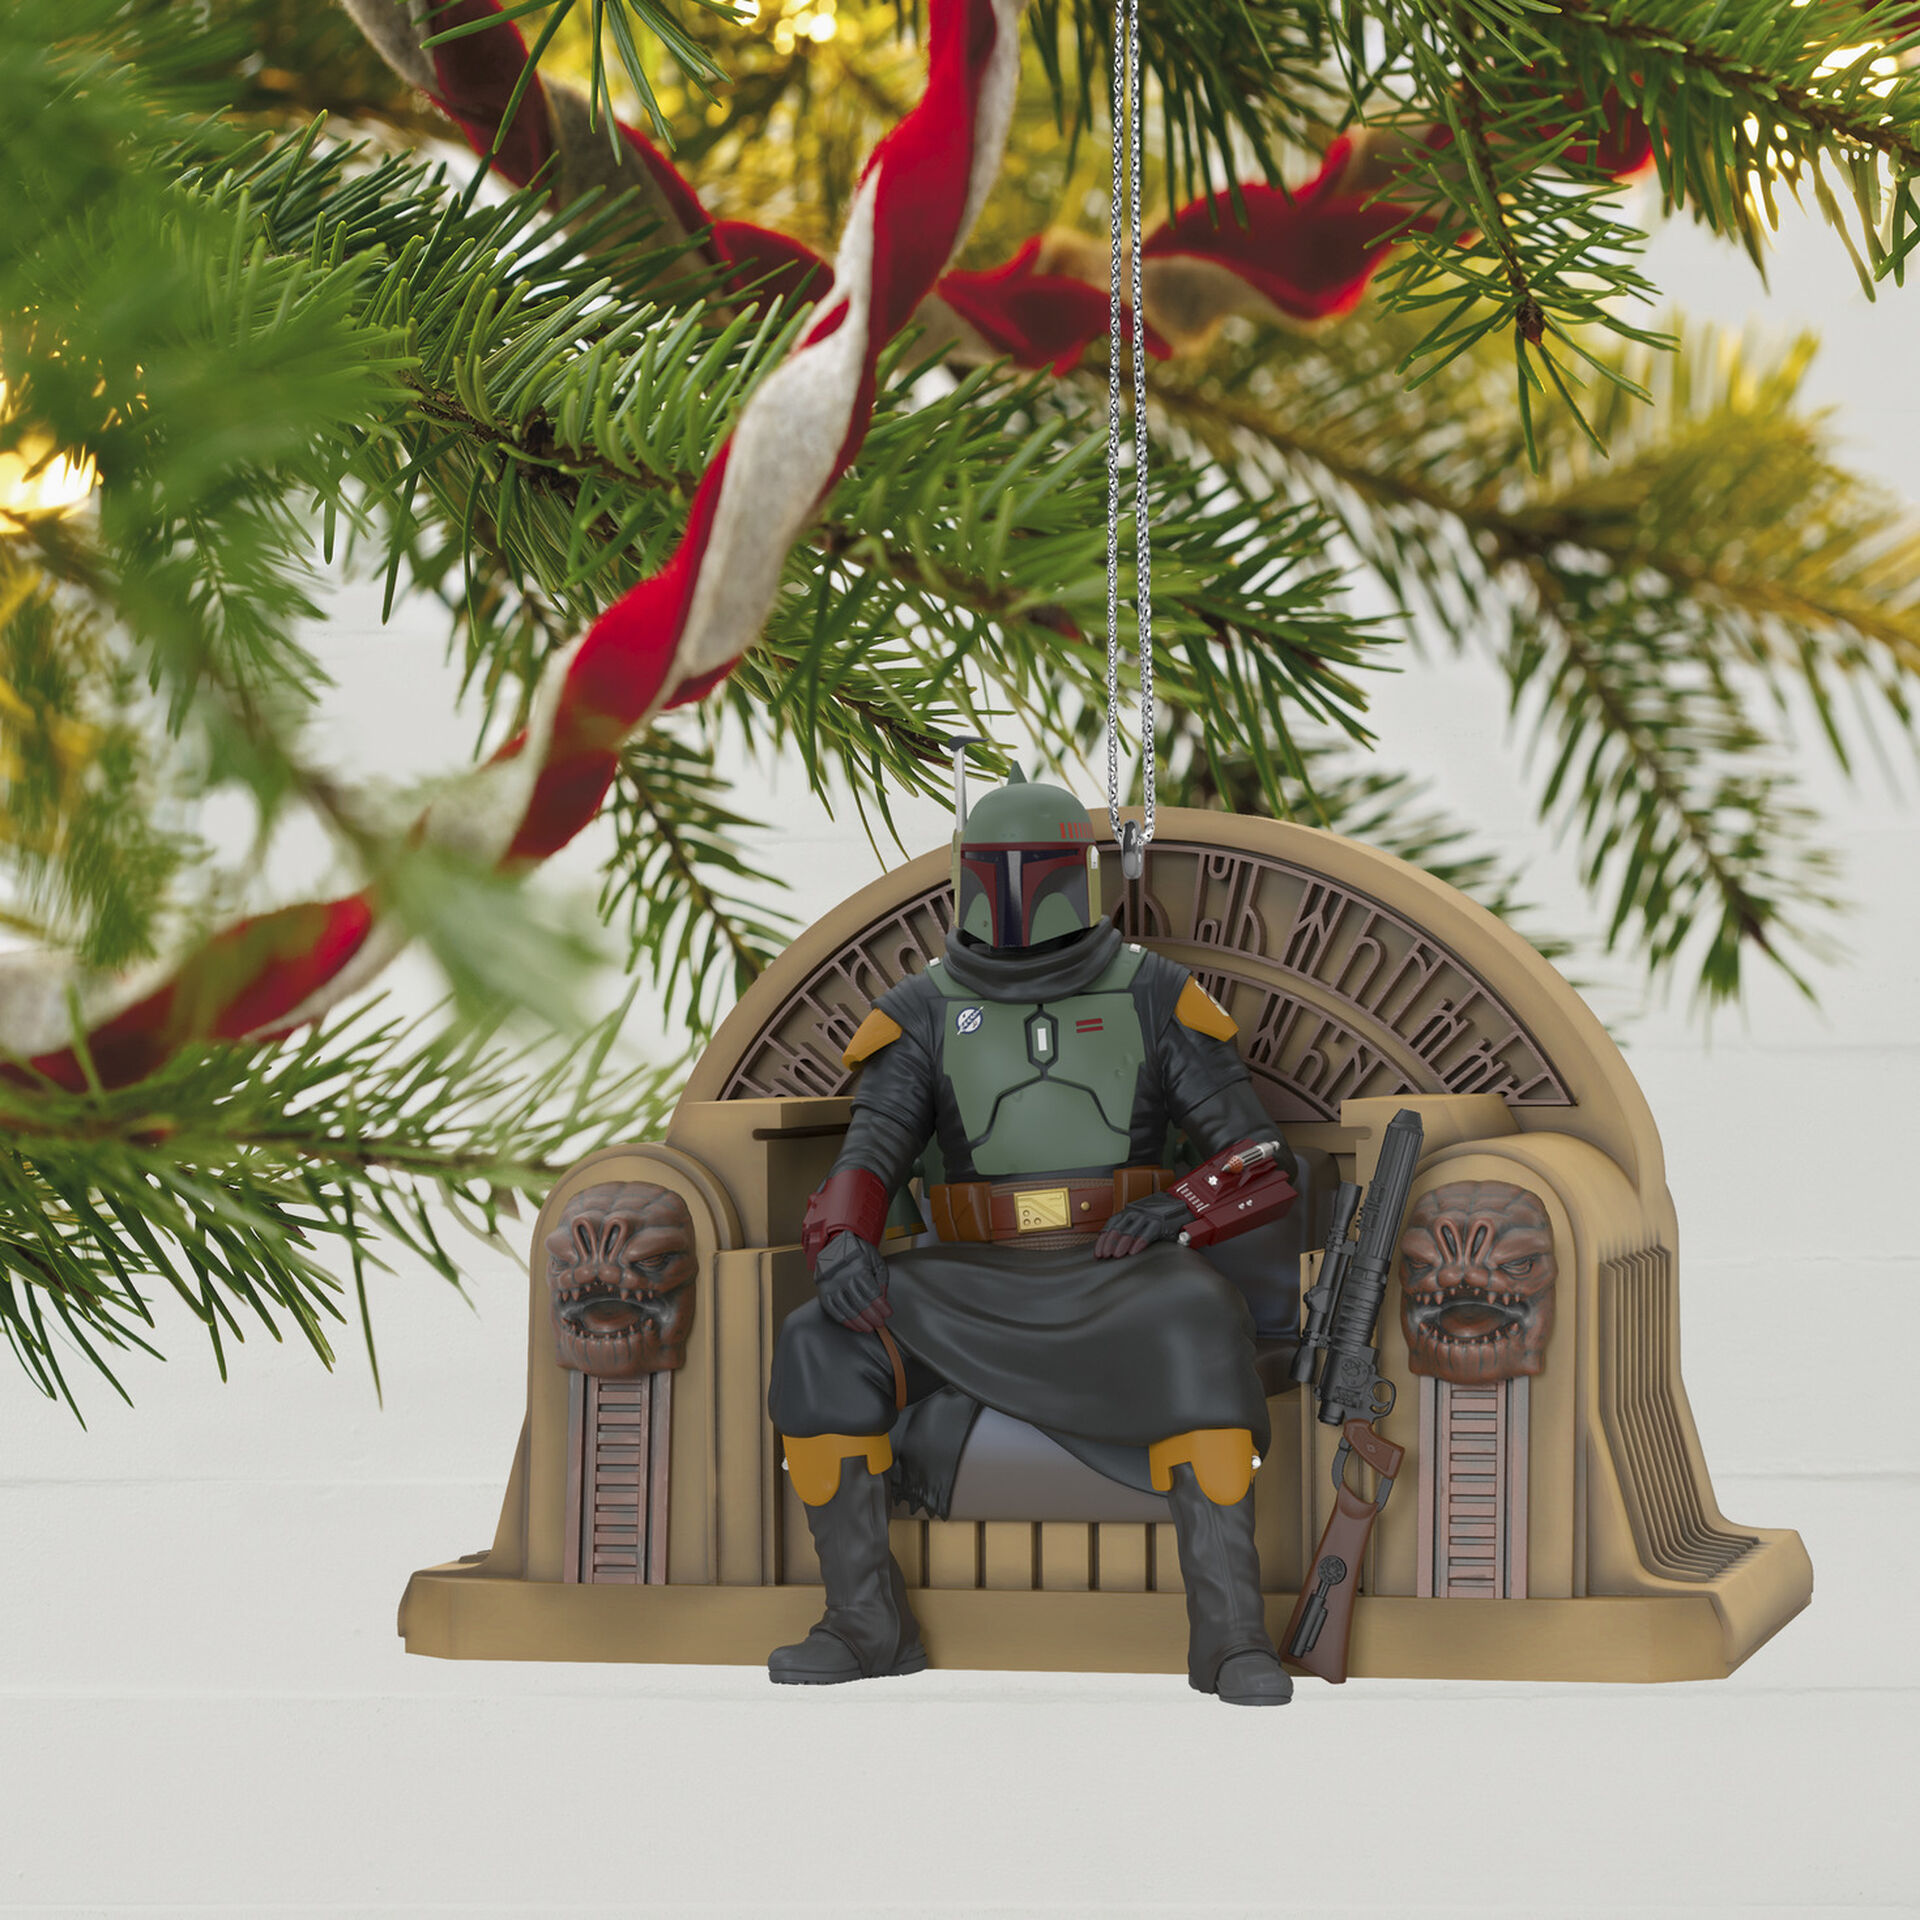 2020 Hallmark Disney Star Wars Boba Fett Helmet Glass Christmas Tree Ornament